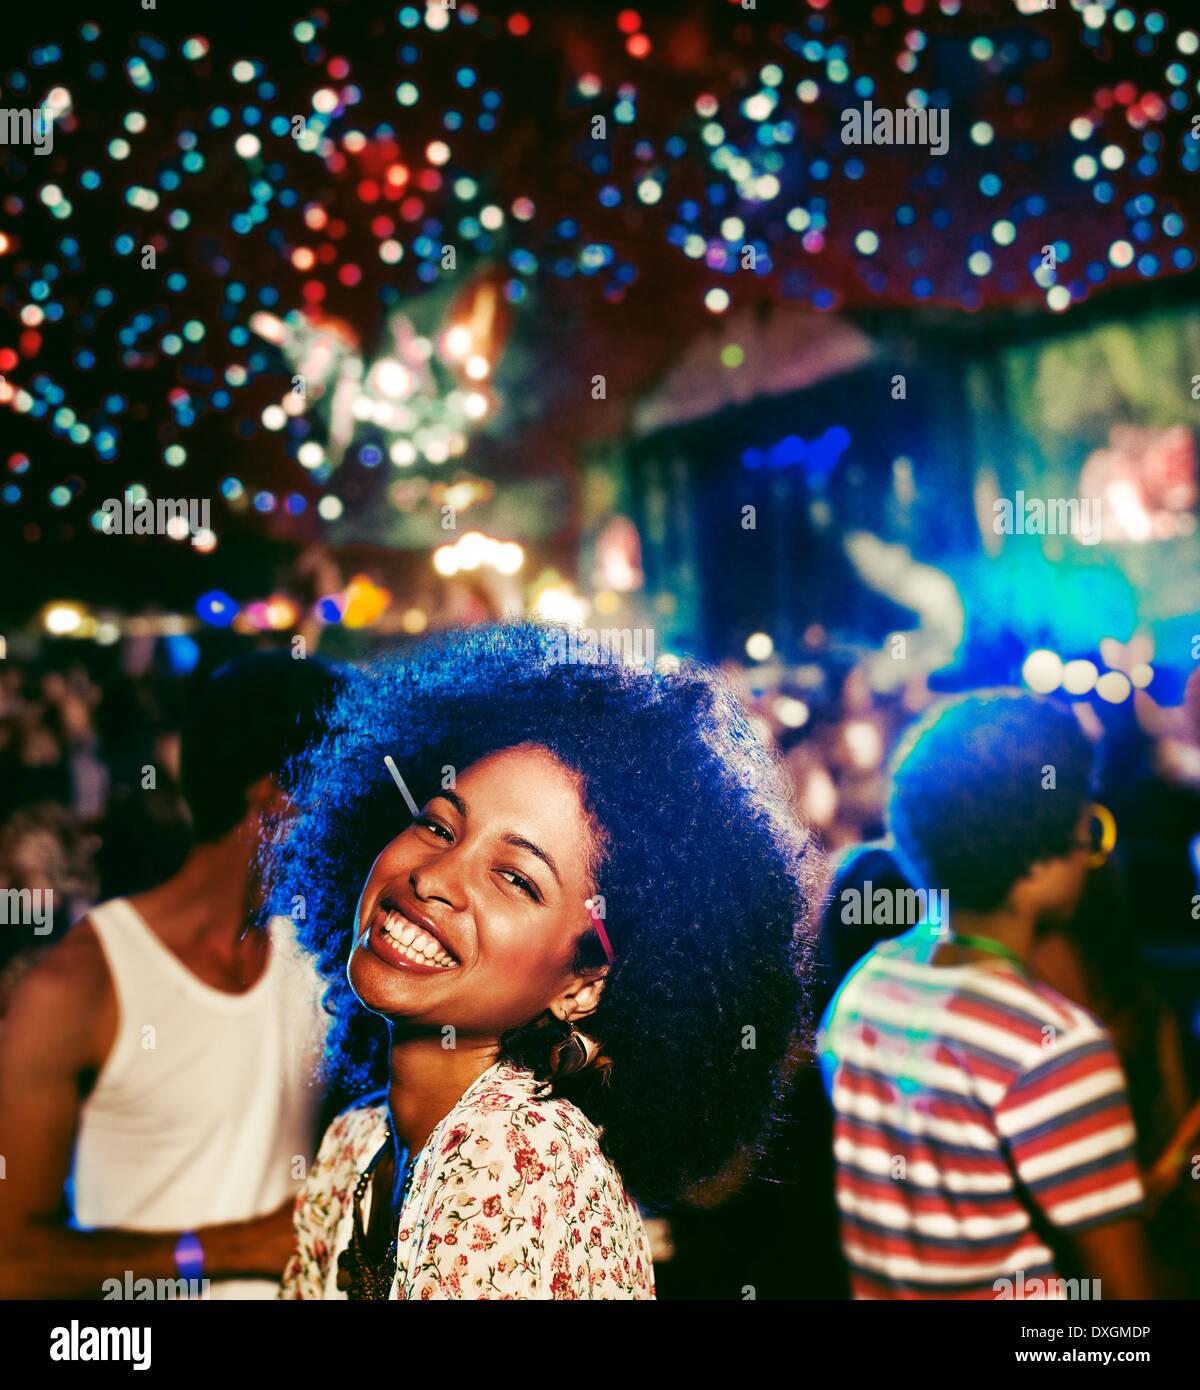 Retrato de mujer entusiasta en music festival Imagen De Stock